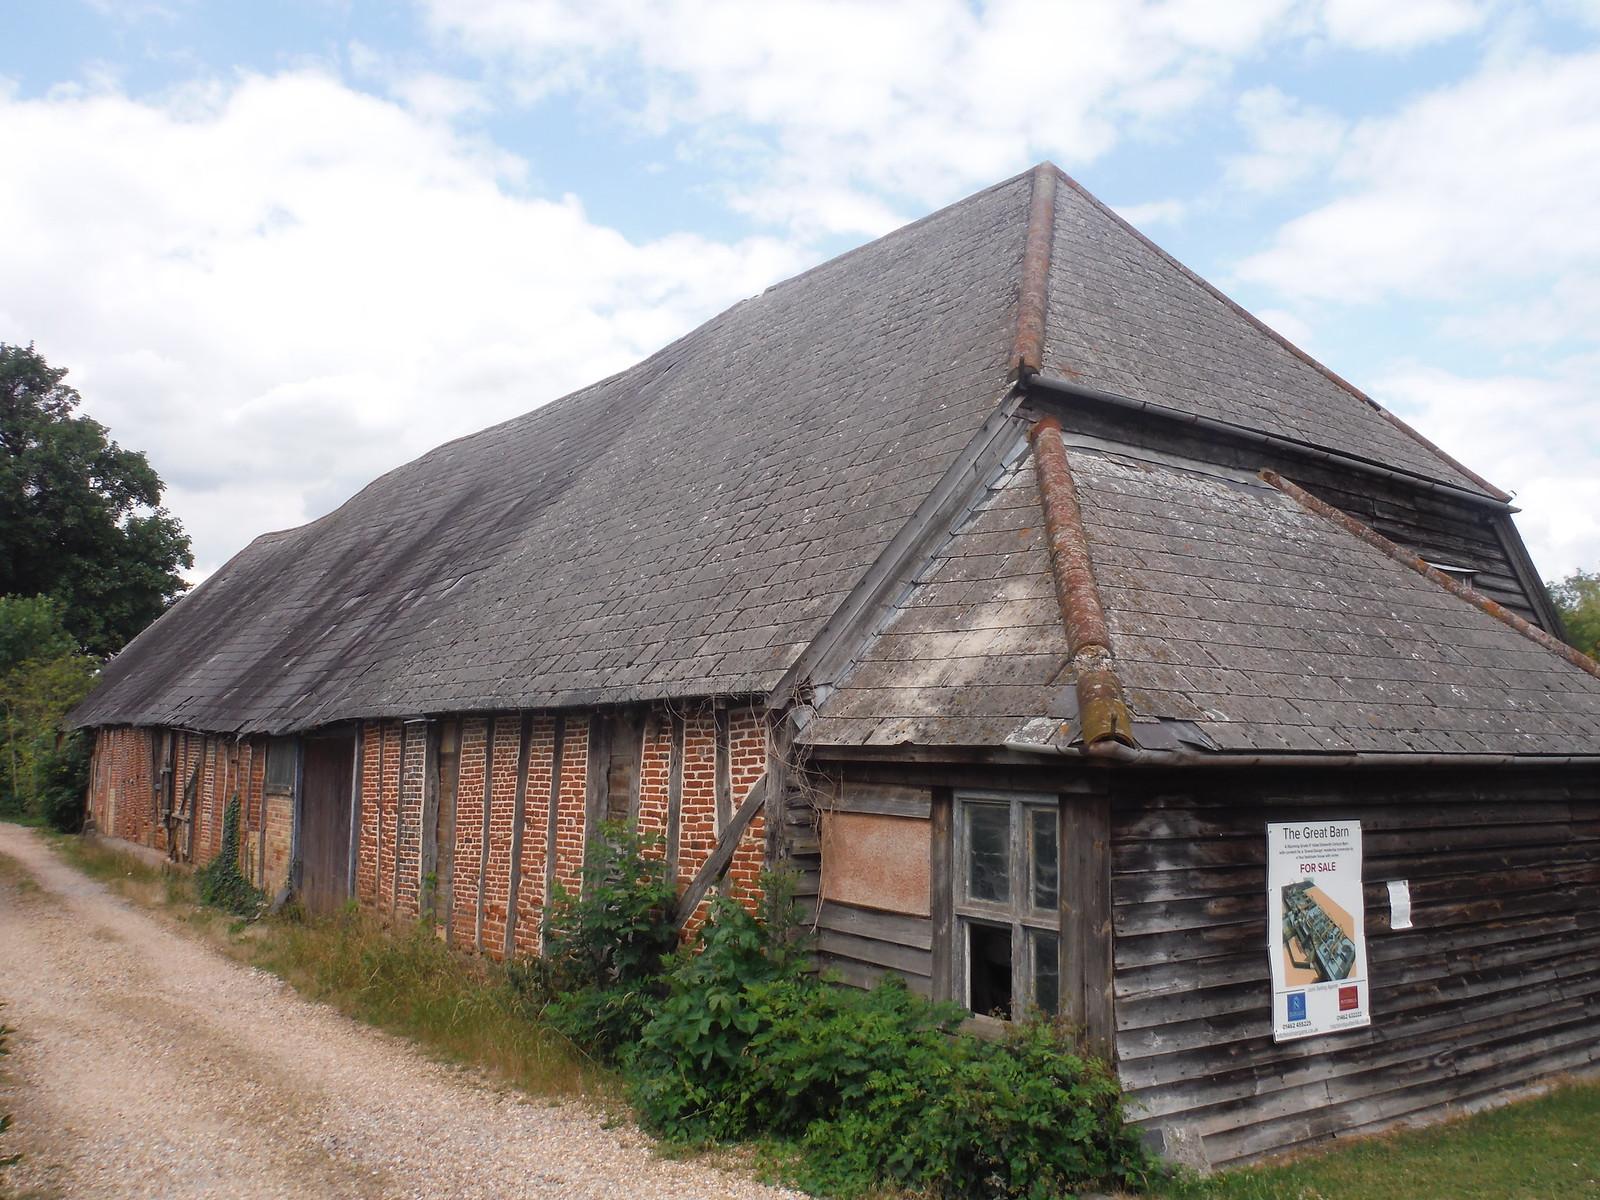 The Great Barn, Pirton SWC Walk 233 - Arlesey to Letchworth Garden City